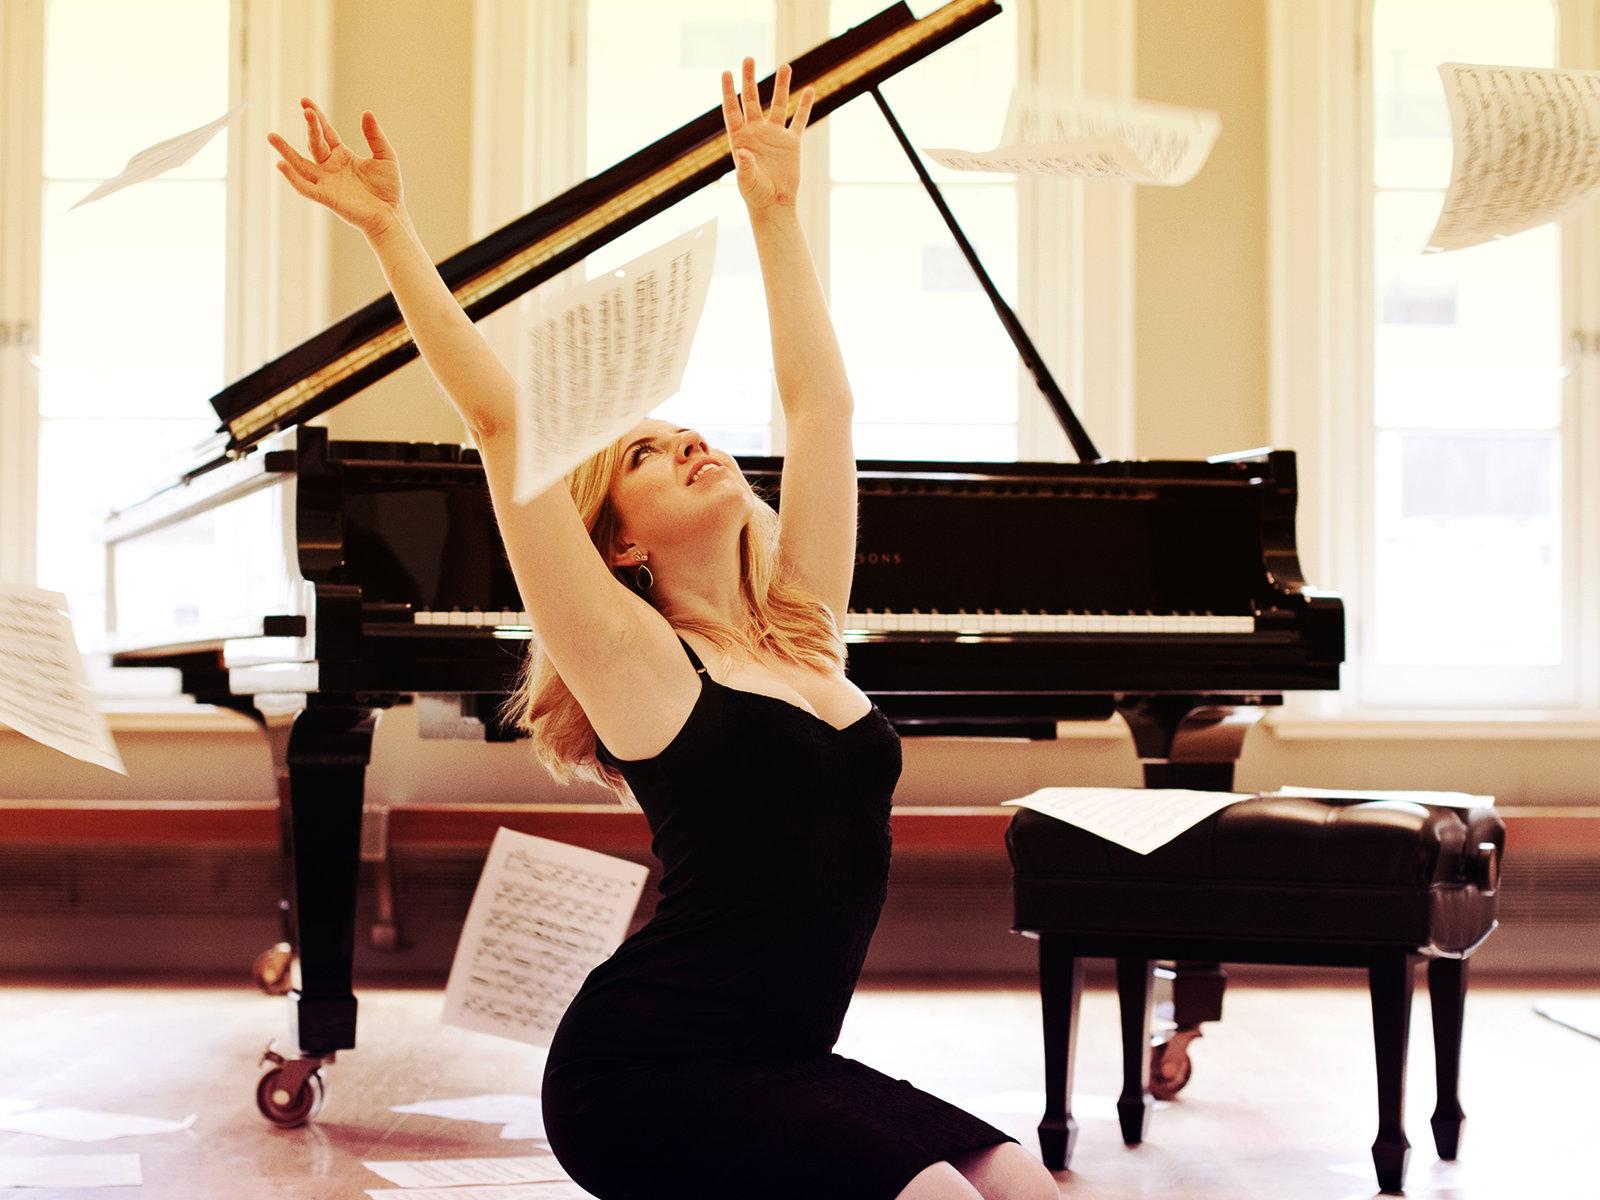 Photo: Pianist Natasha Paremski